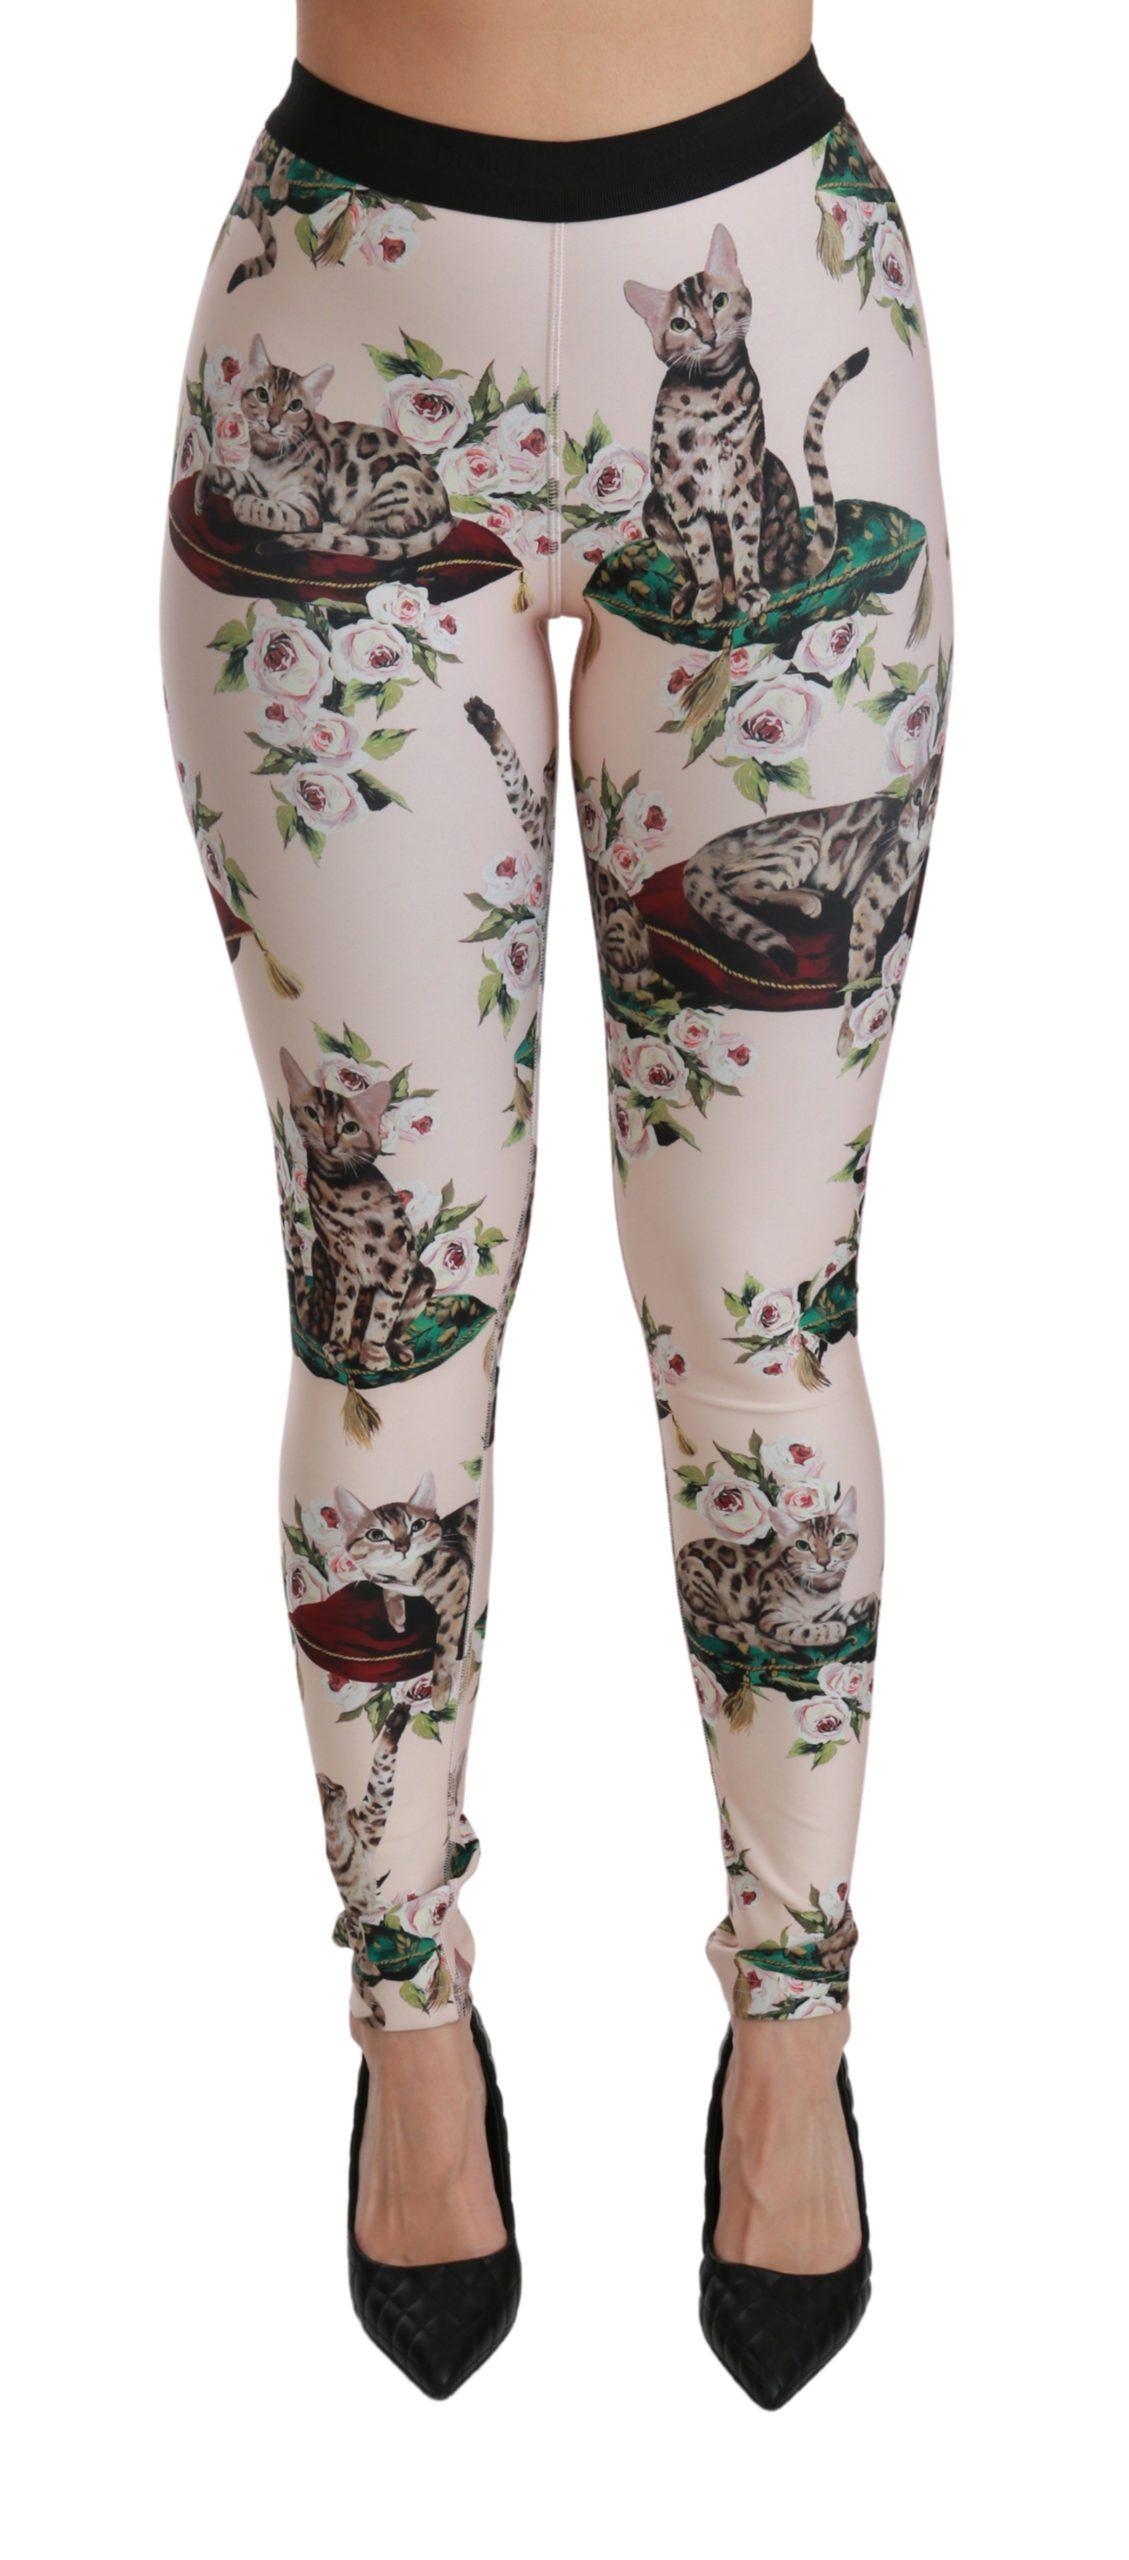 Dolce & Gabbana Women's Floral Bengal Cat Leggings Trouser Multicolor PAN70812 - IT36 | XS